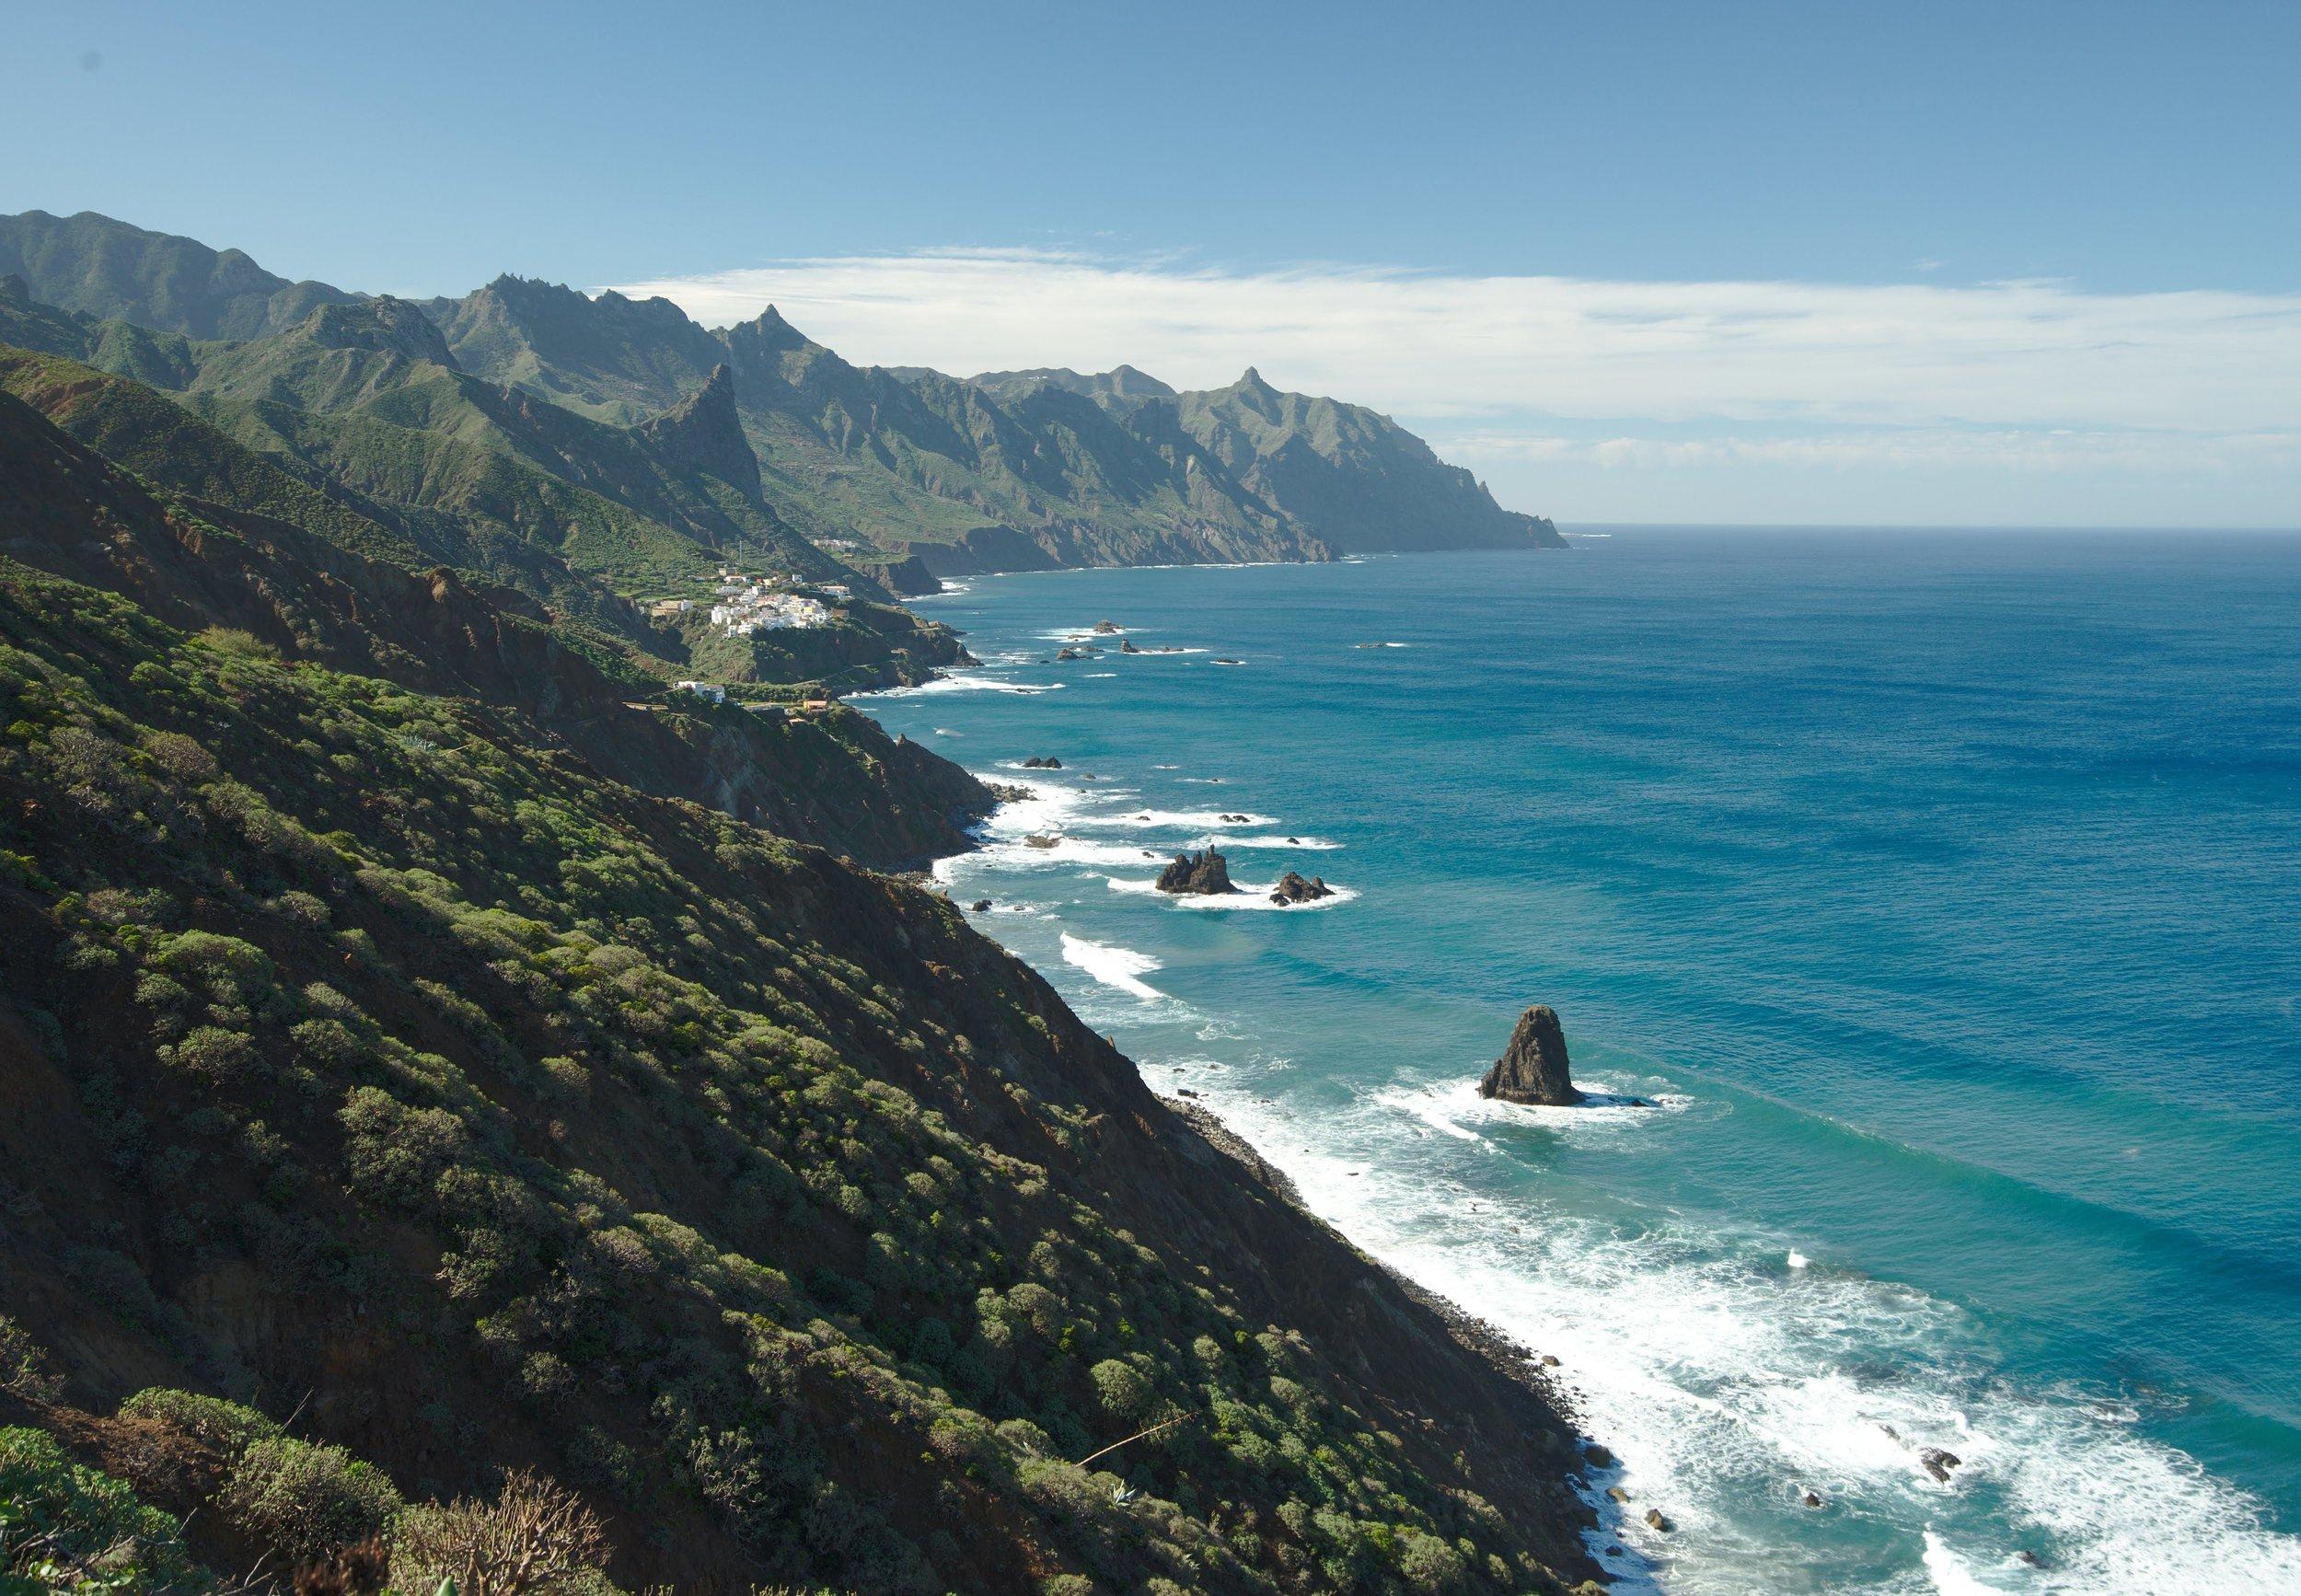 Anaga coast - photo by Novomonde